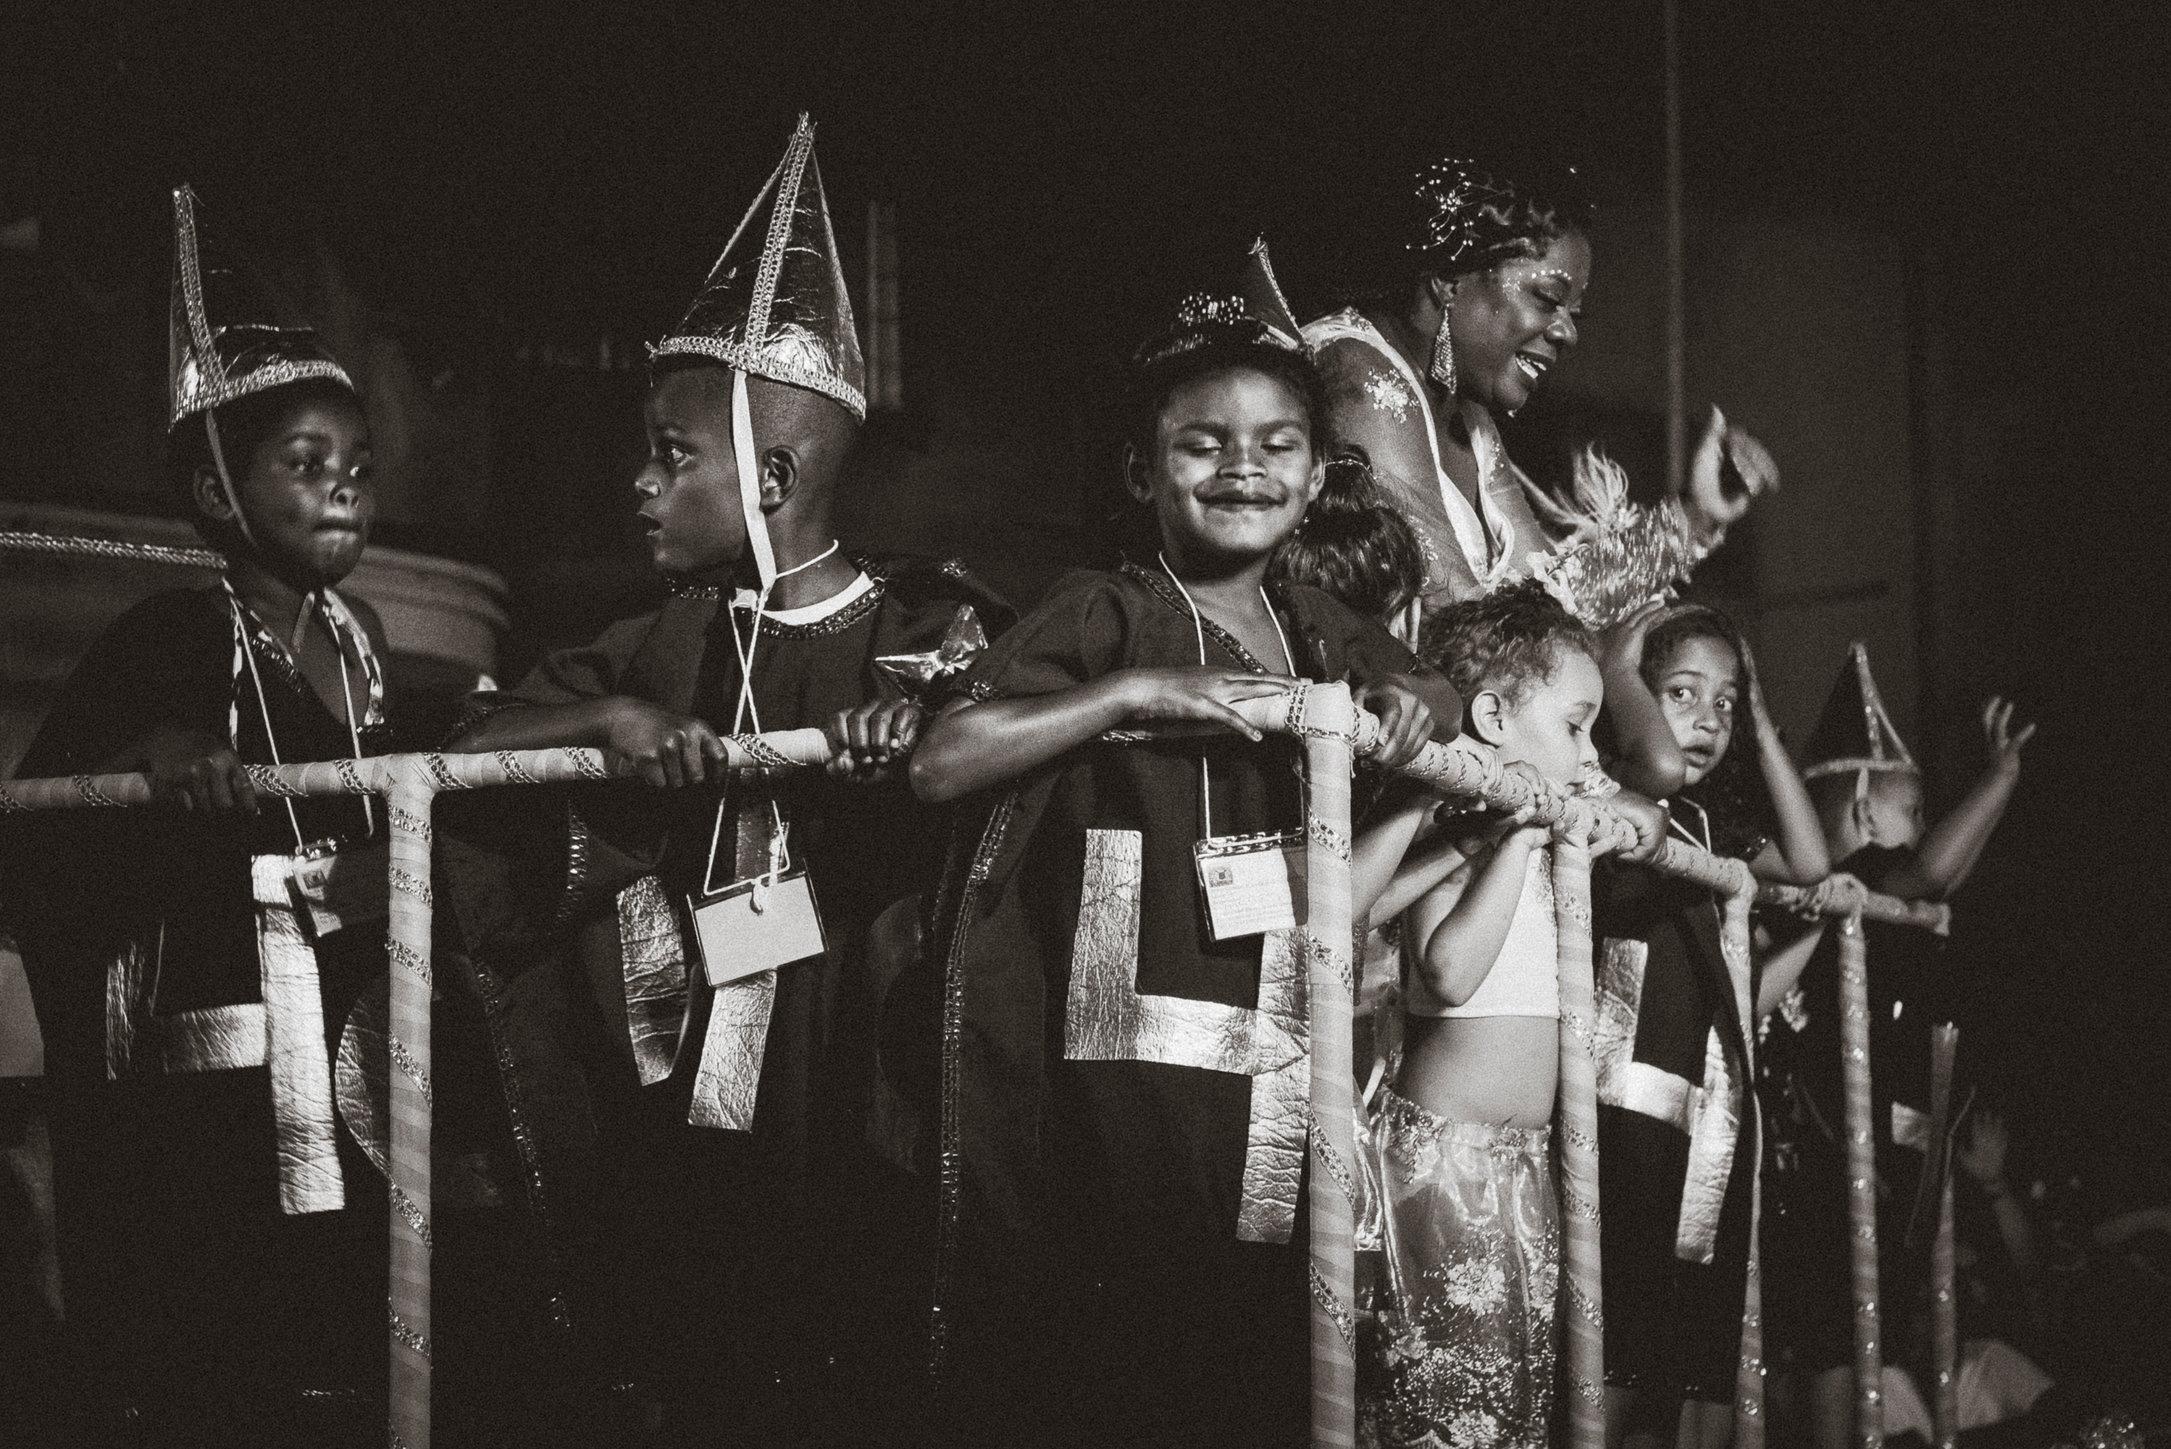 20180212-Carnaval-3.jpg